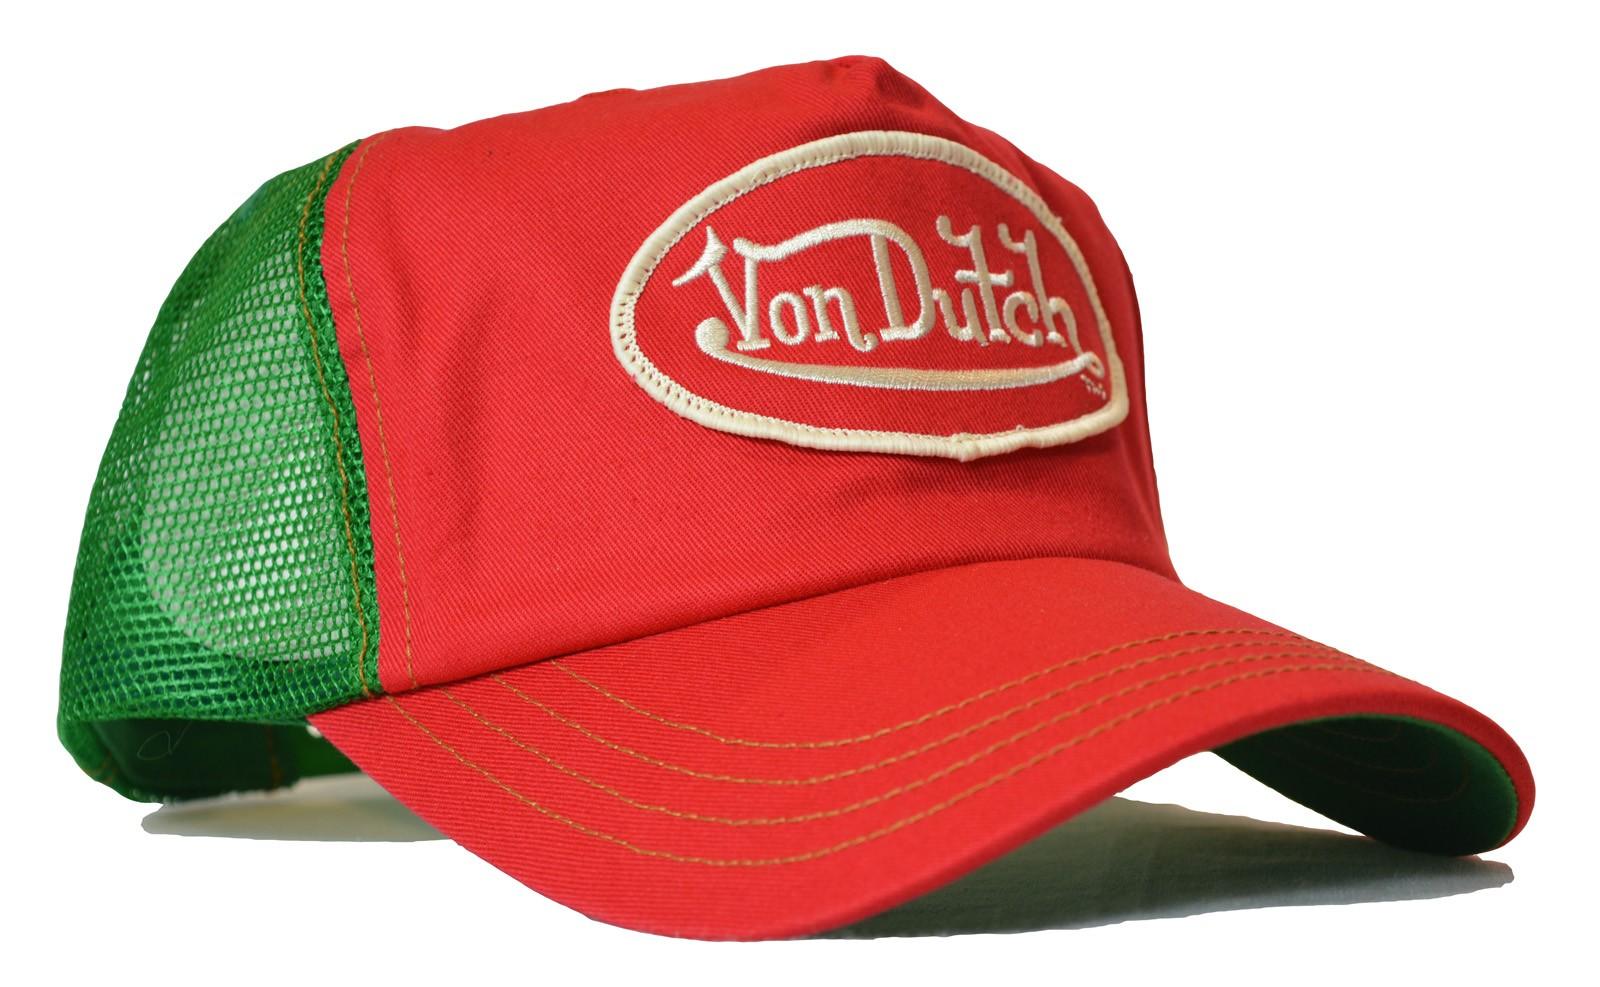 Von Dutch - Classic Red/Green Mesh Trucker Cap